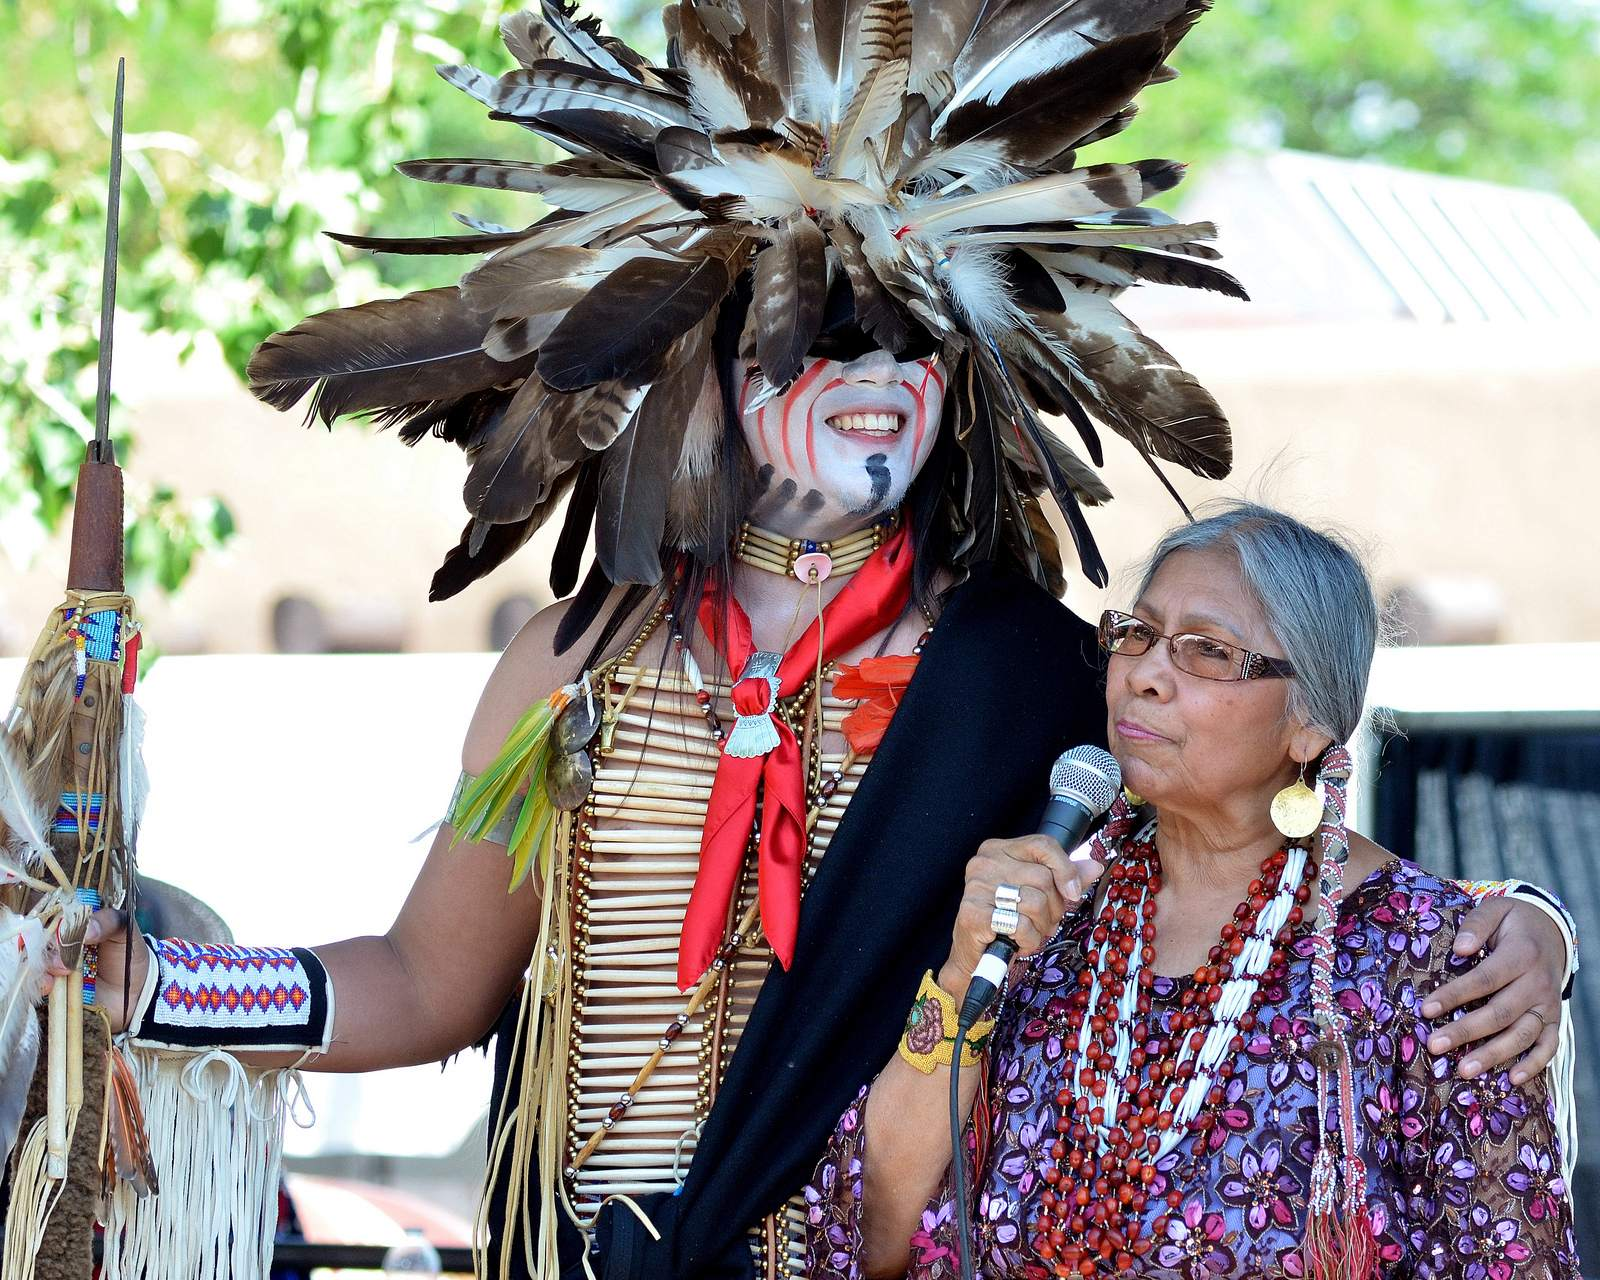 native american clothing11 Native American Clothing Contest at Santa Fe Indian Market